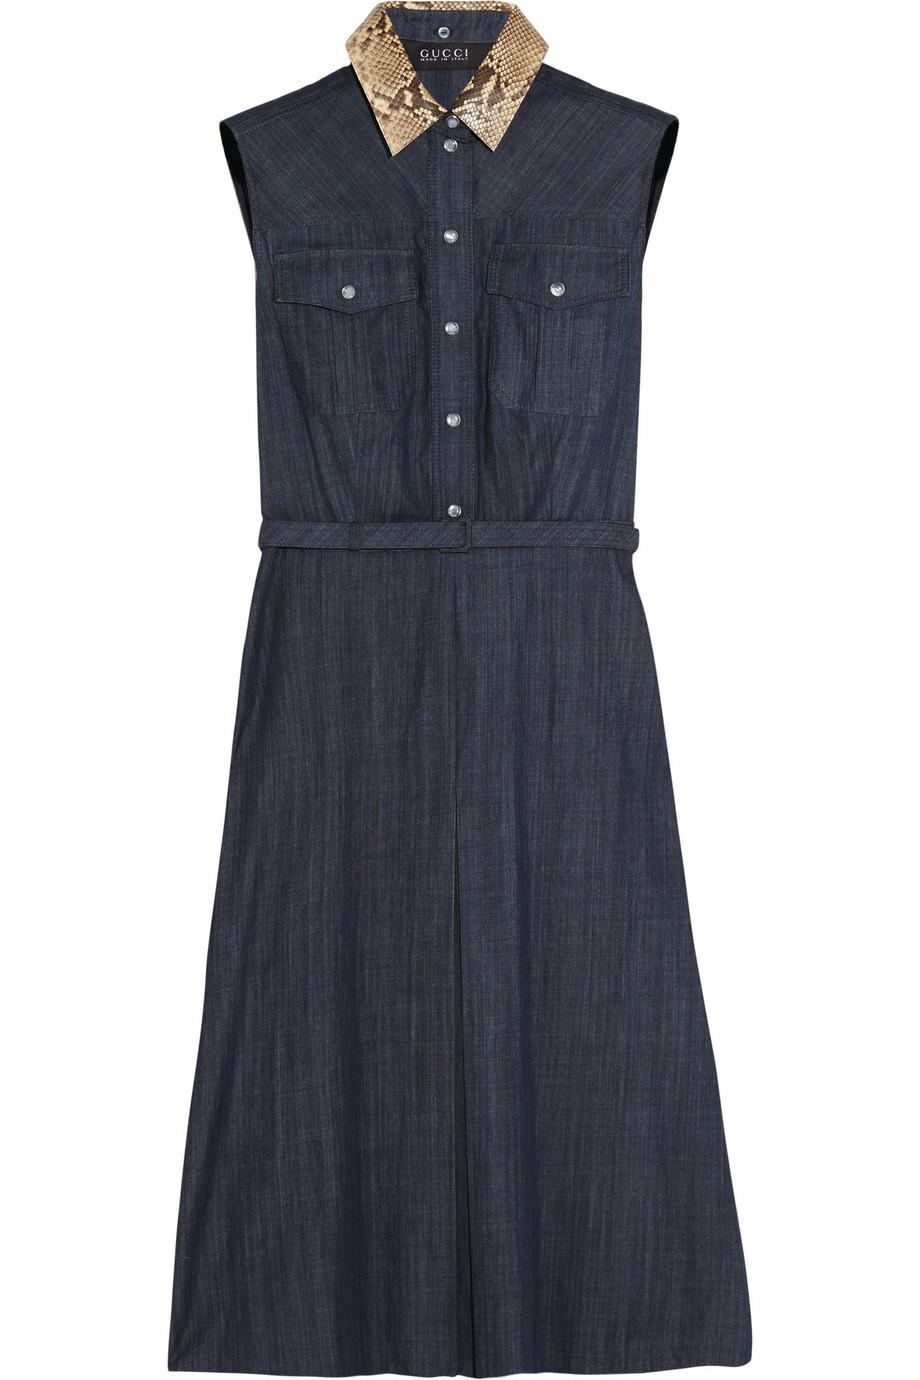 Gucci Python-Trimmed Denim Dress, Size: 36